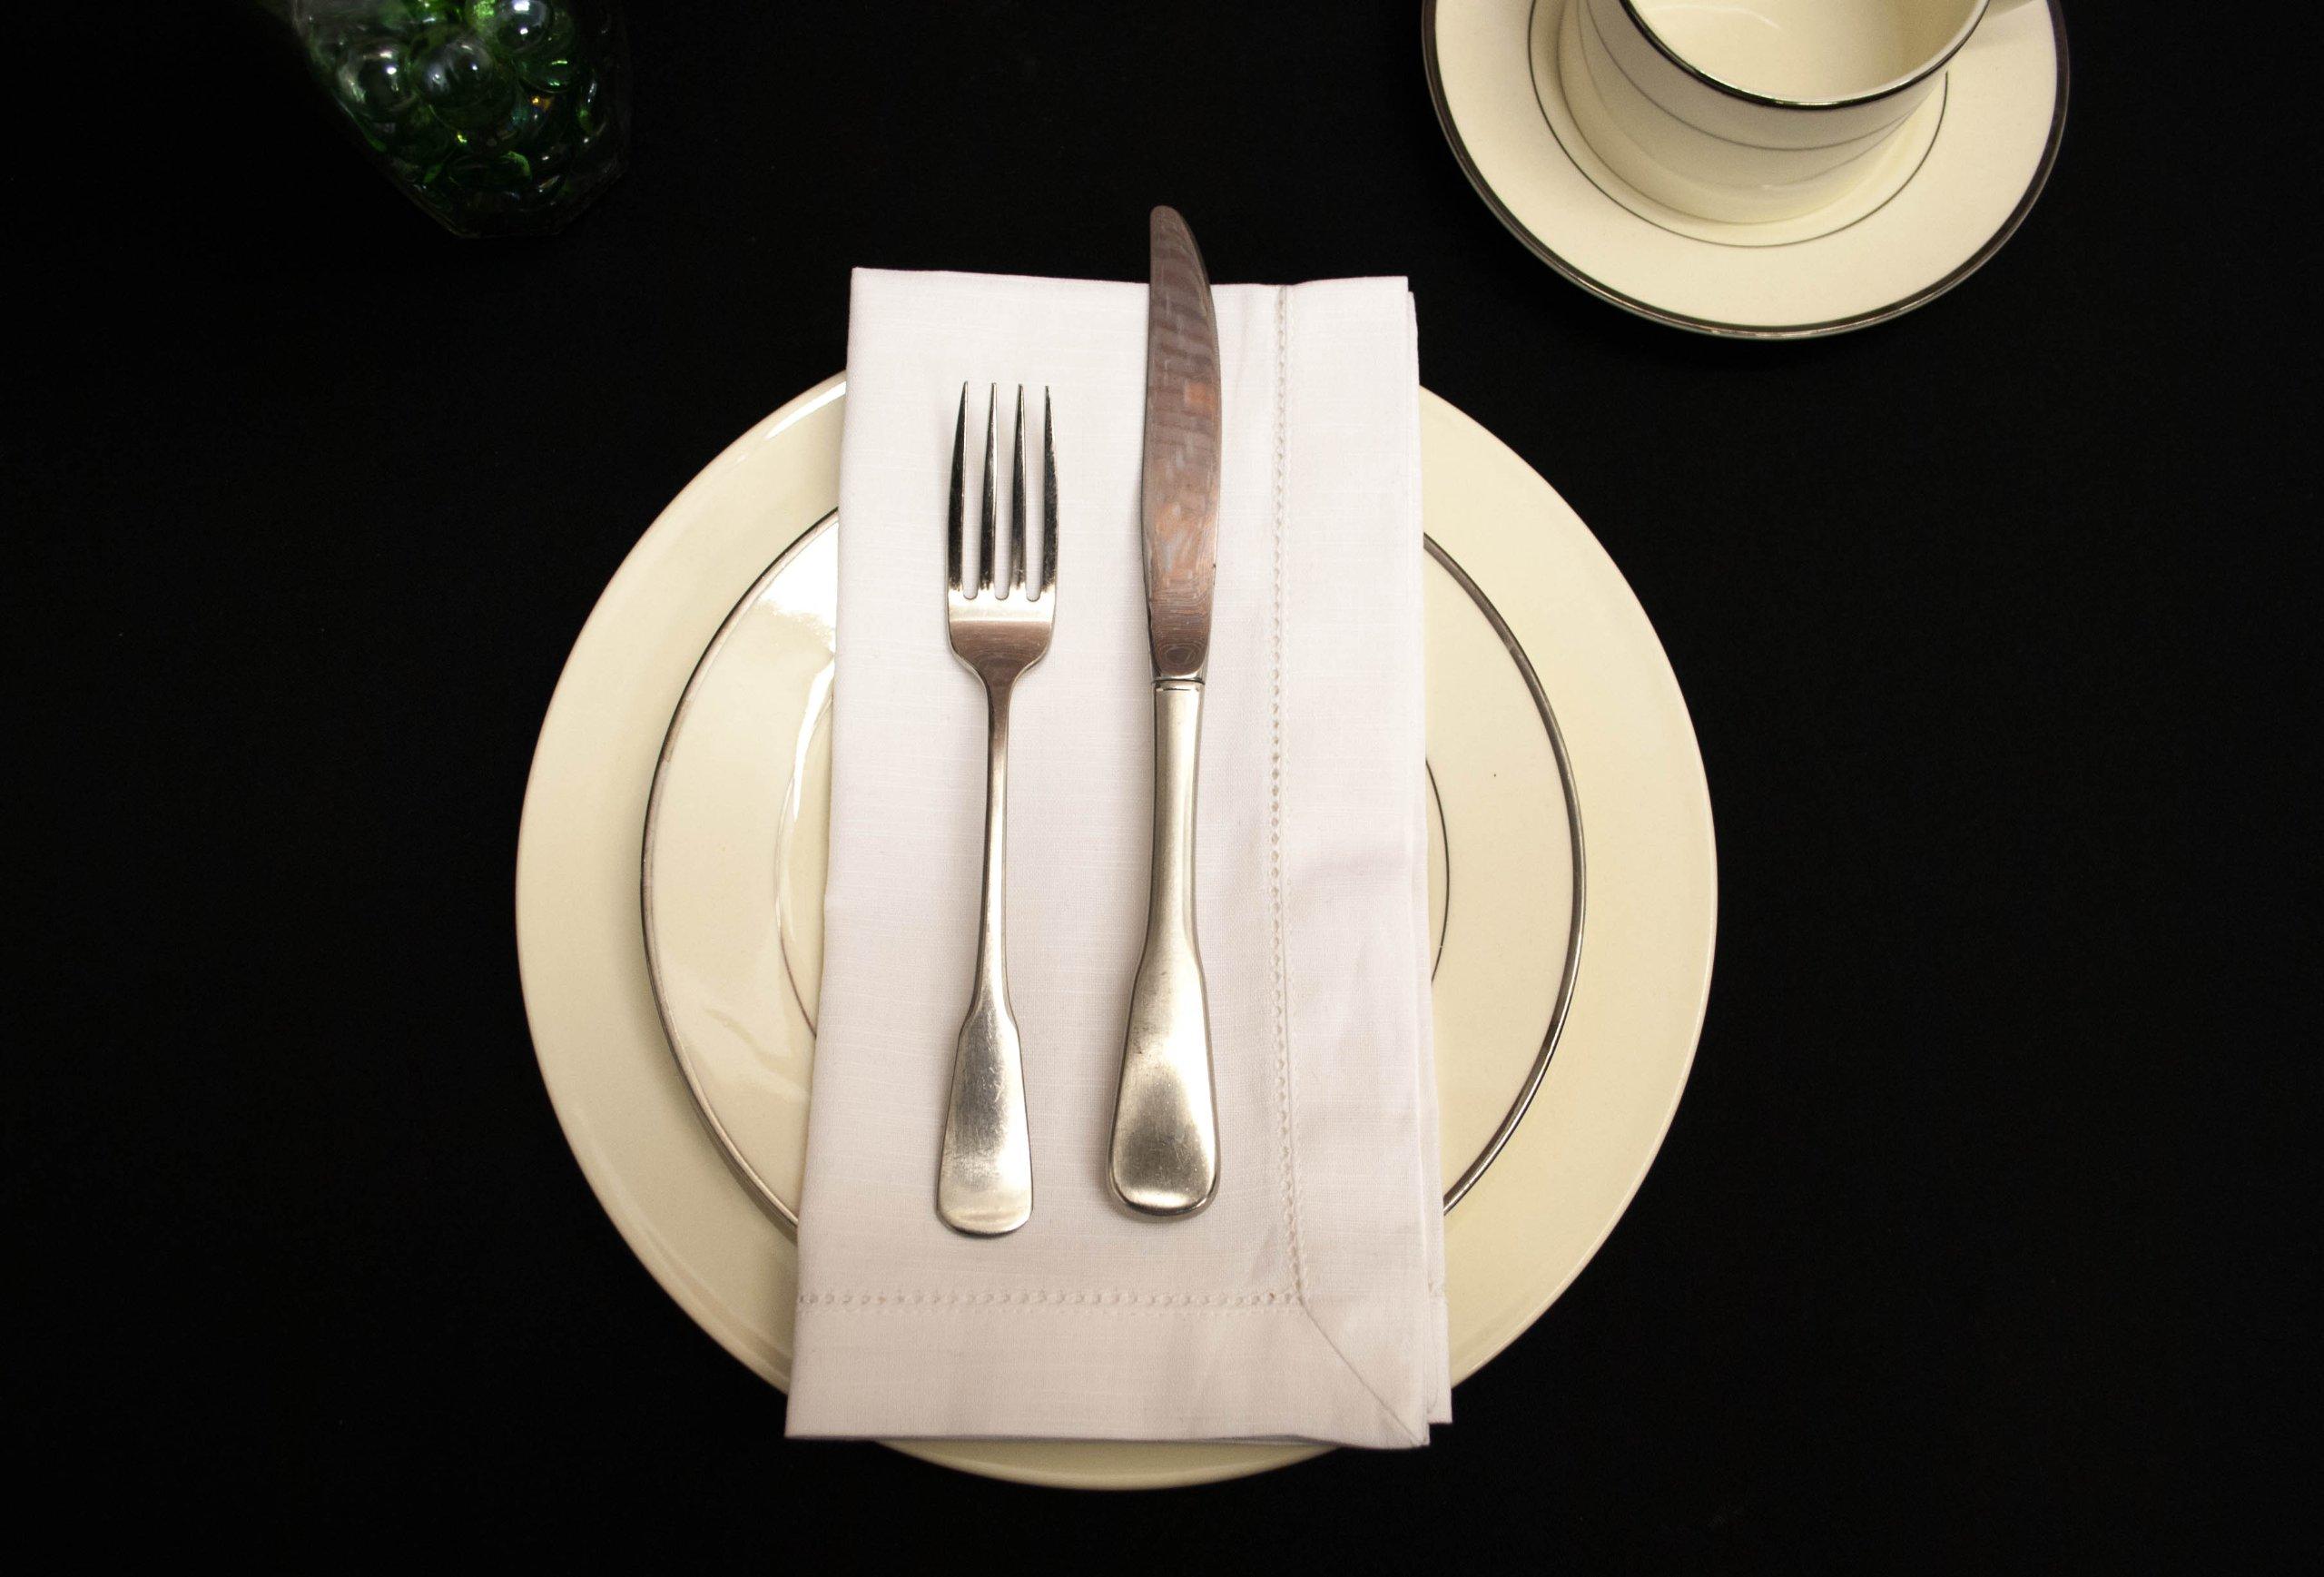 Hemstitch Dinner Napkins White 1 Dozen by Something Different Linen by Something Different Linen (Image #1)